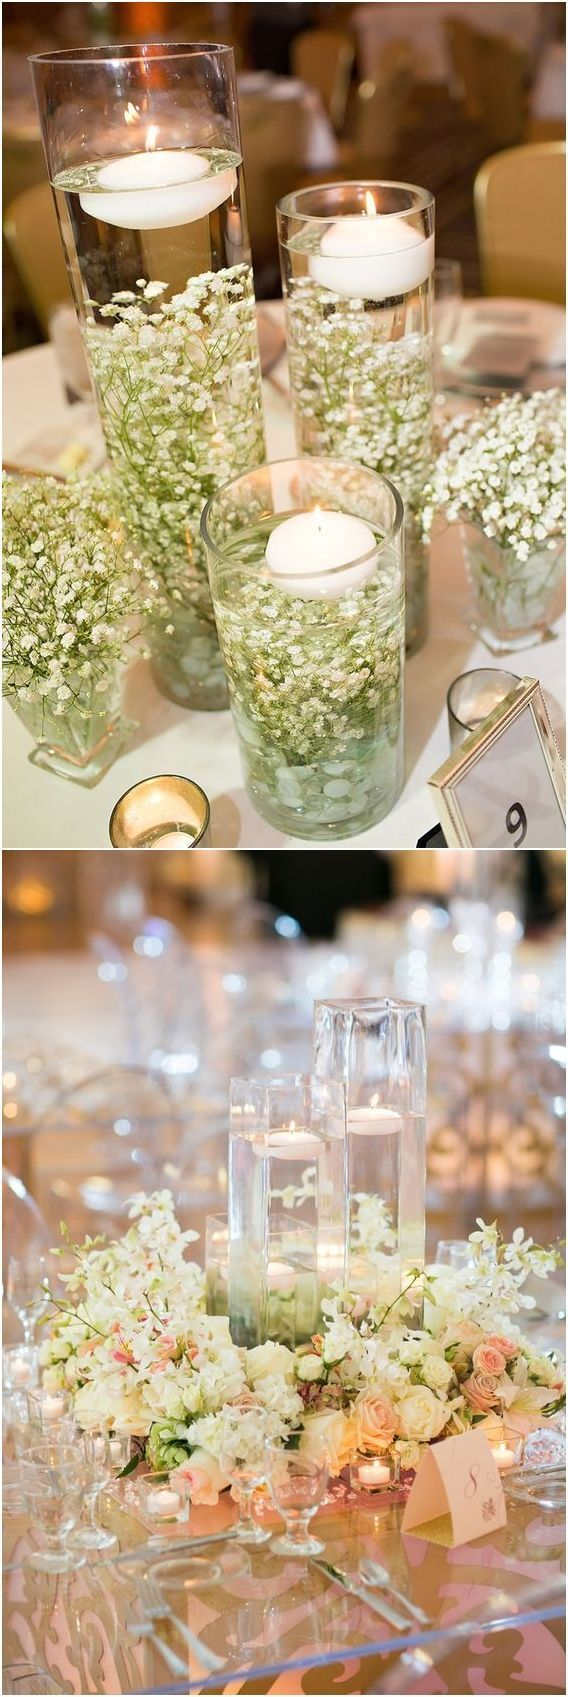 Romantic floating wedding centerpiece ideas #wedding #weddingideas #centerpiece / http://www.deerpearlflowers.com/floating-wedding-centerpieces/ #weddingcenterpieces